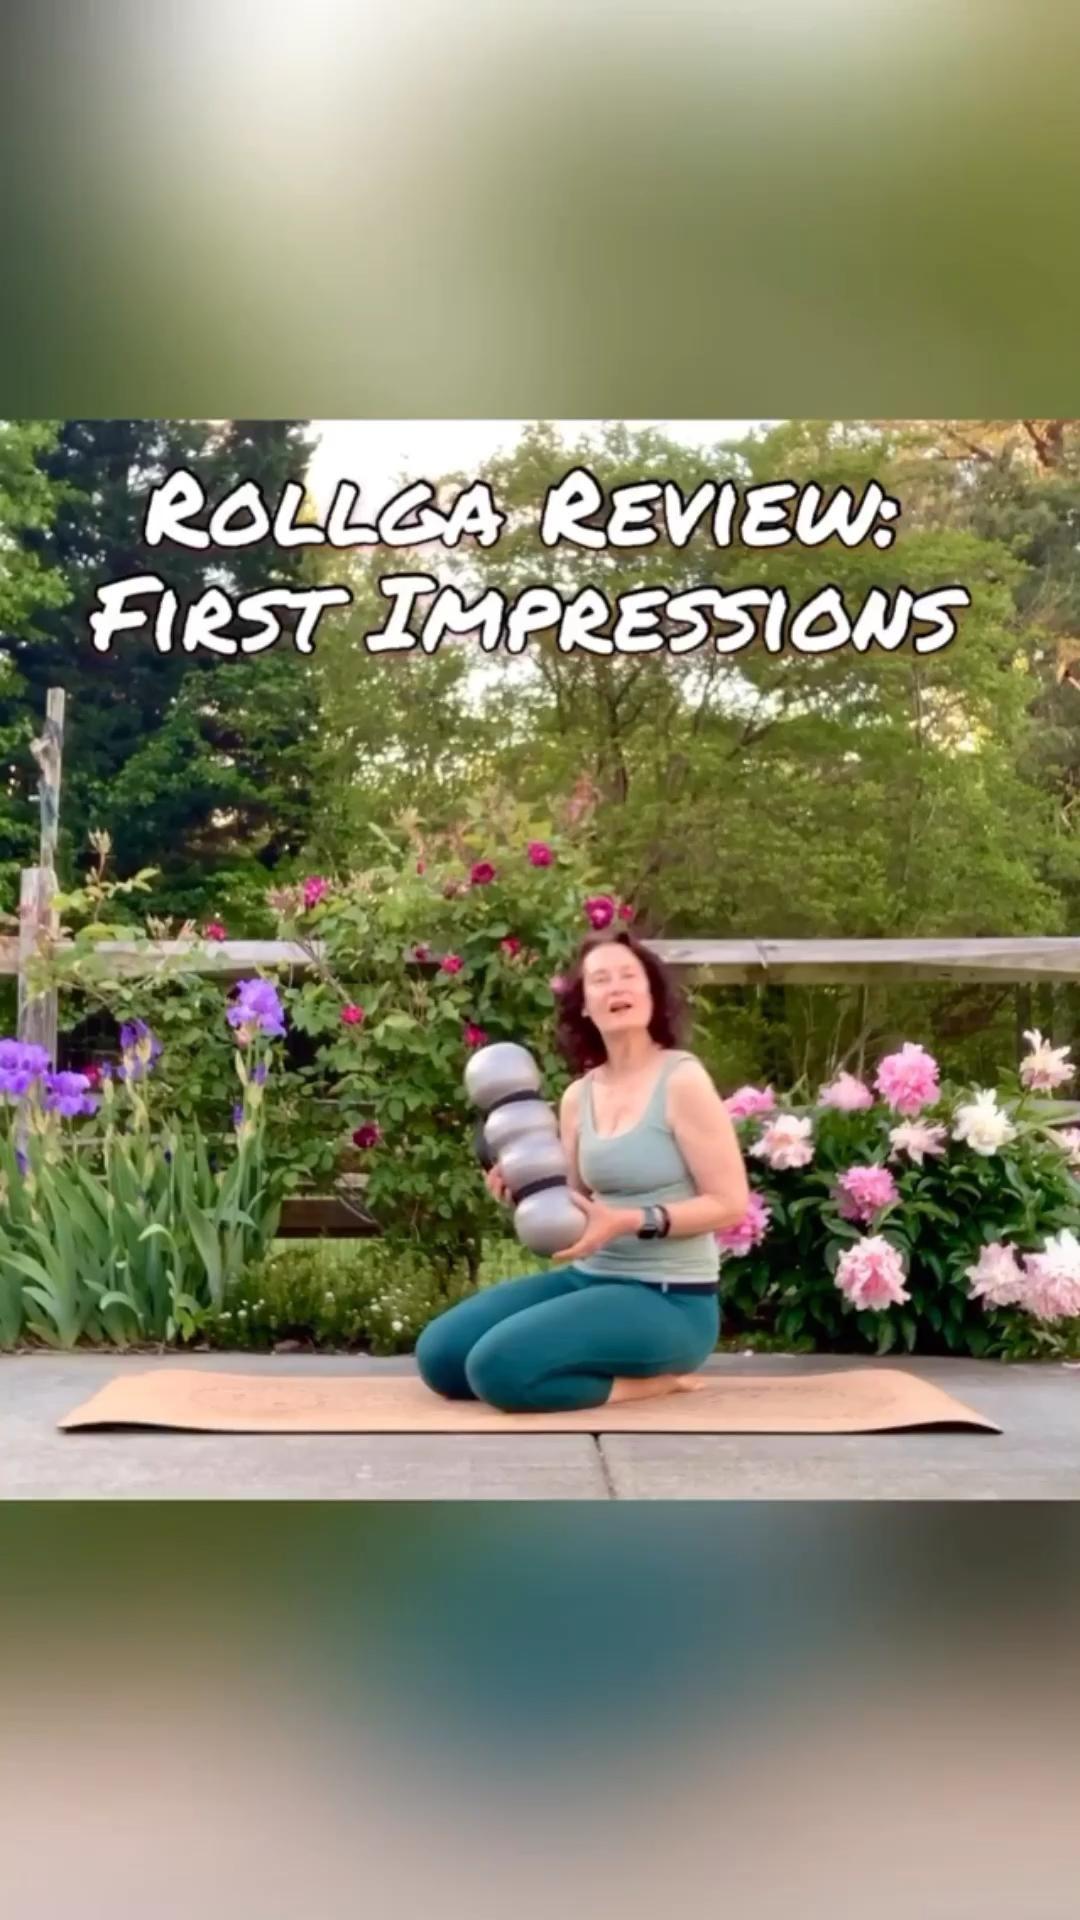 Testimonial of the Rollga Foam Roller! #rollga #rollgaroller #foamroller #foamrolling #shinsplints #sportsinjury #backpain #yoga #selfcare #selfcaresunday #selfmassage #massage #bodycare #recovery #restday #takecare #quarantine #socialdistancing #release #digdeep #ahhspot